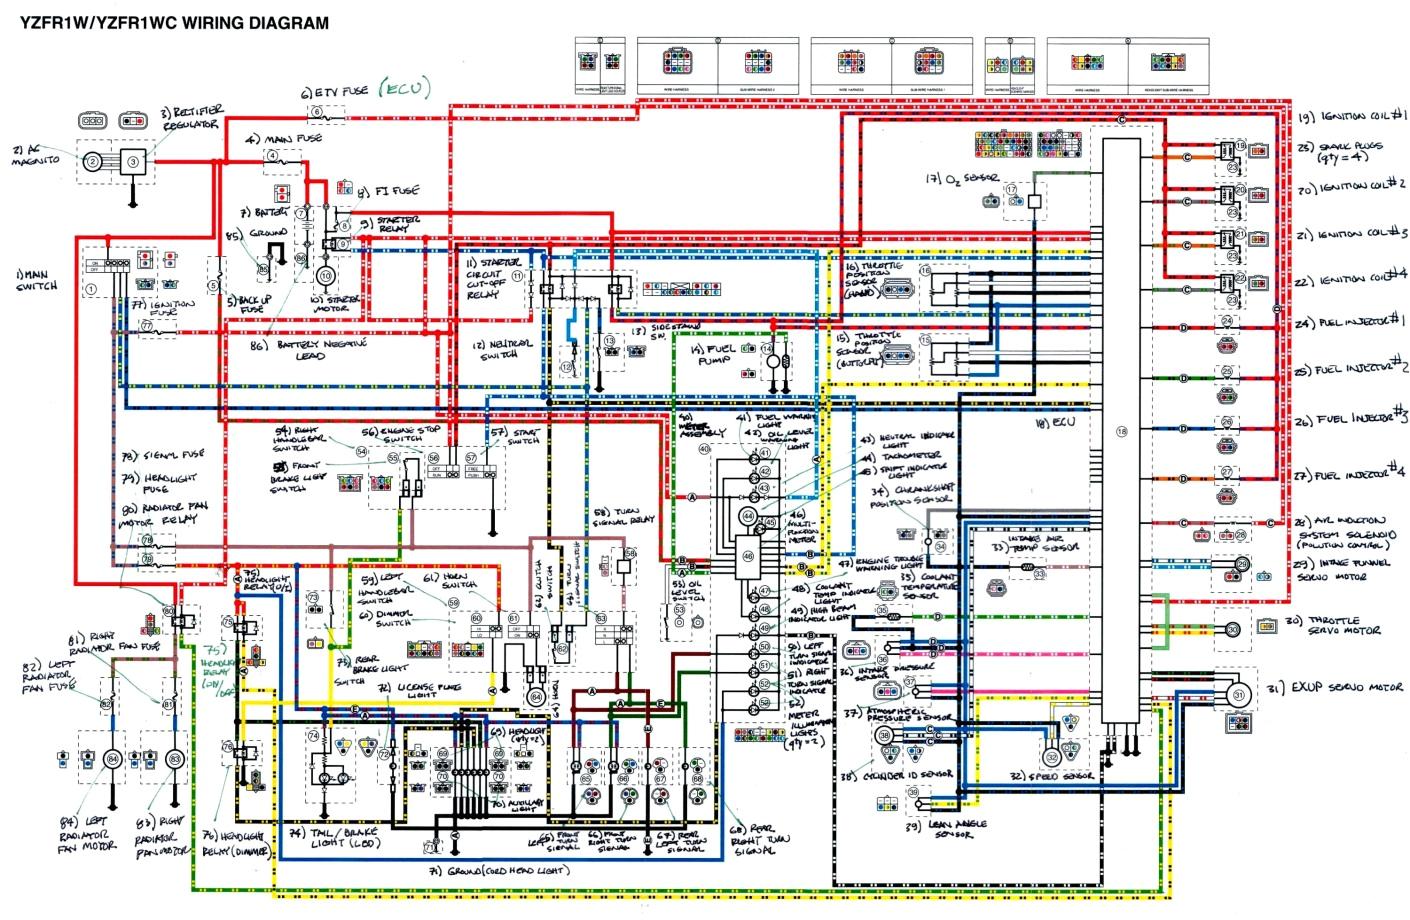 roadliner wiring diagram wiring library 2003 yamaha r1 wiring diagram circuit diagram schema grizzly 660 wiring